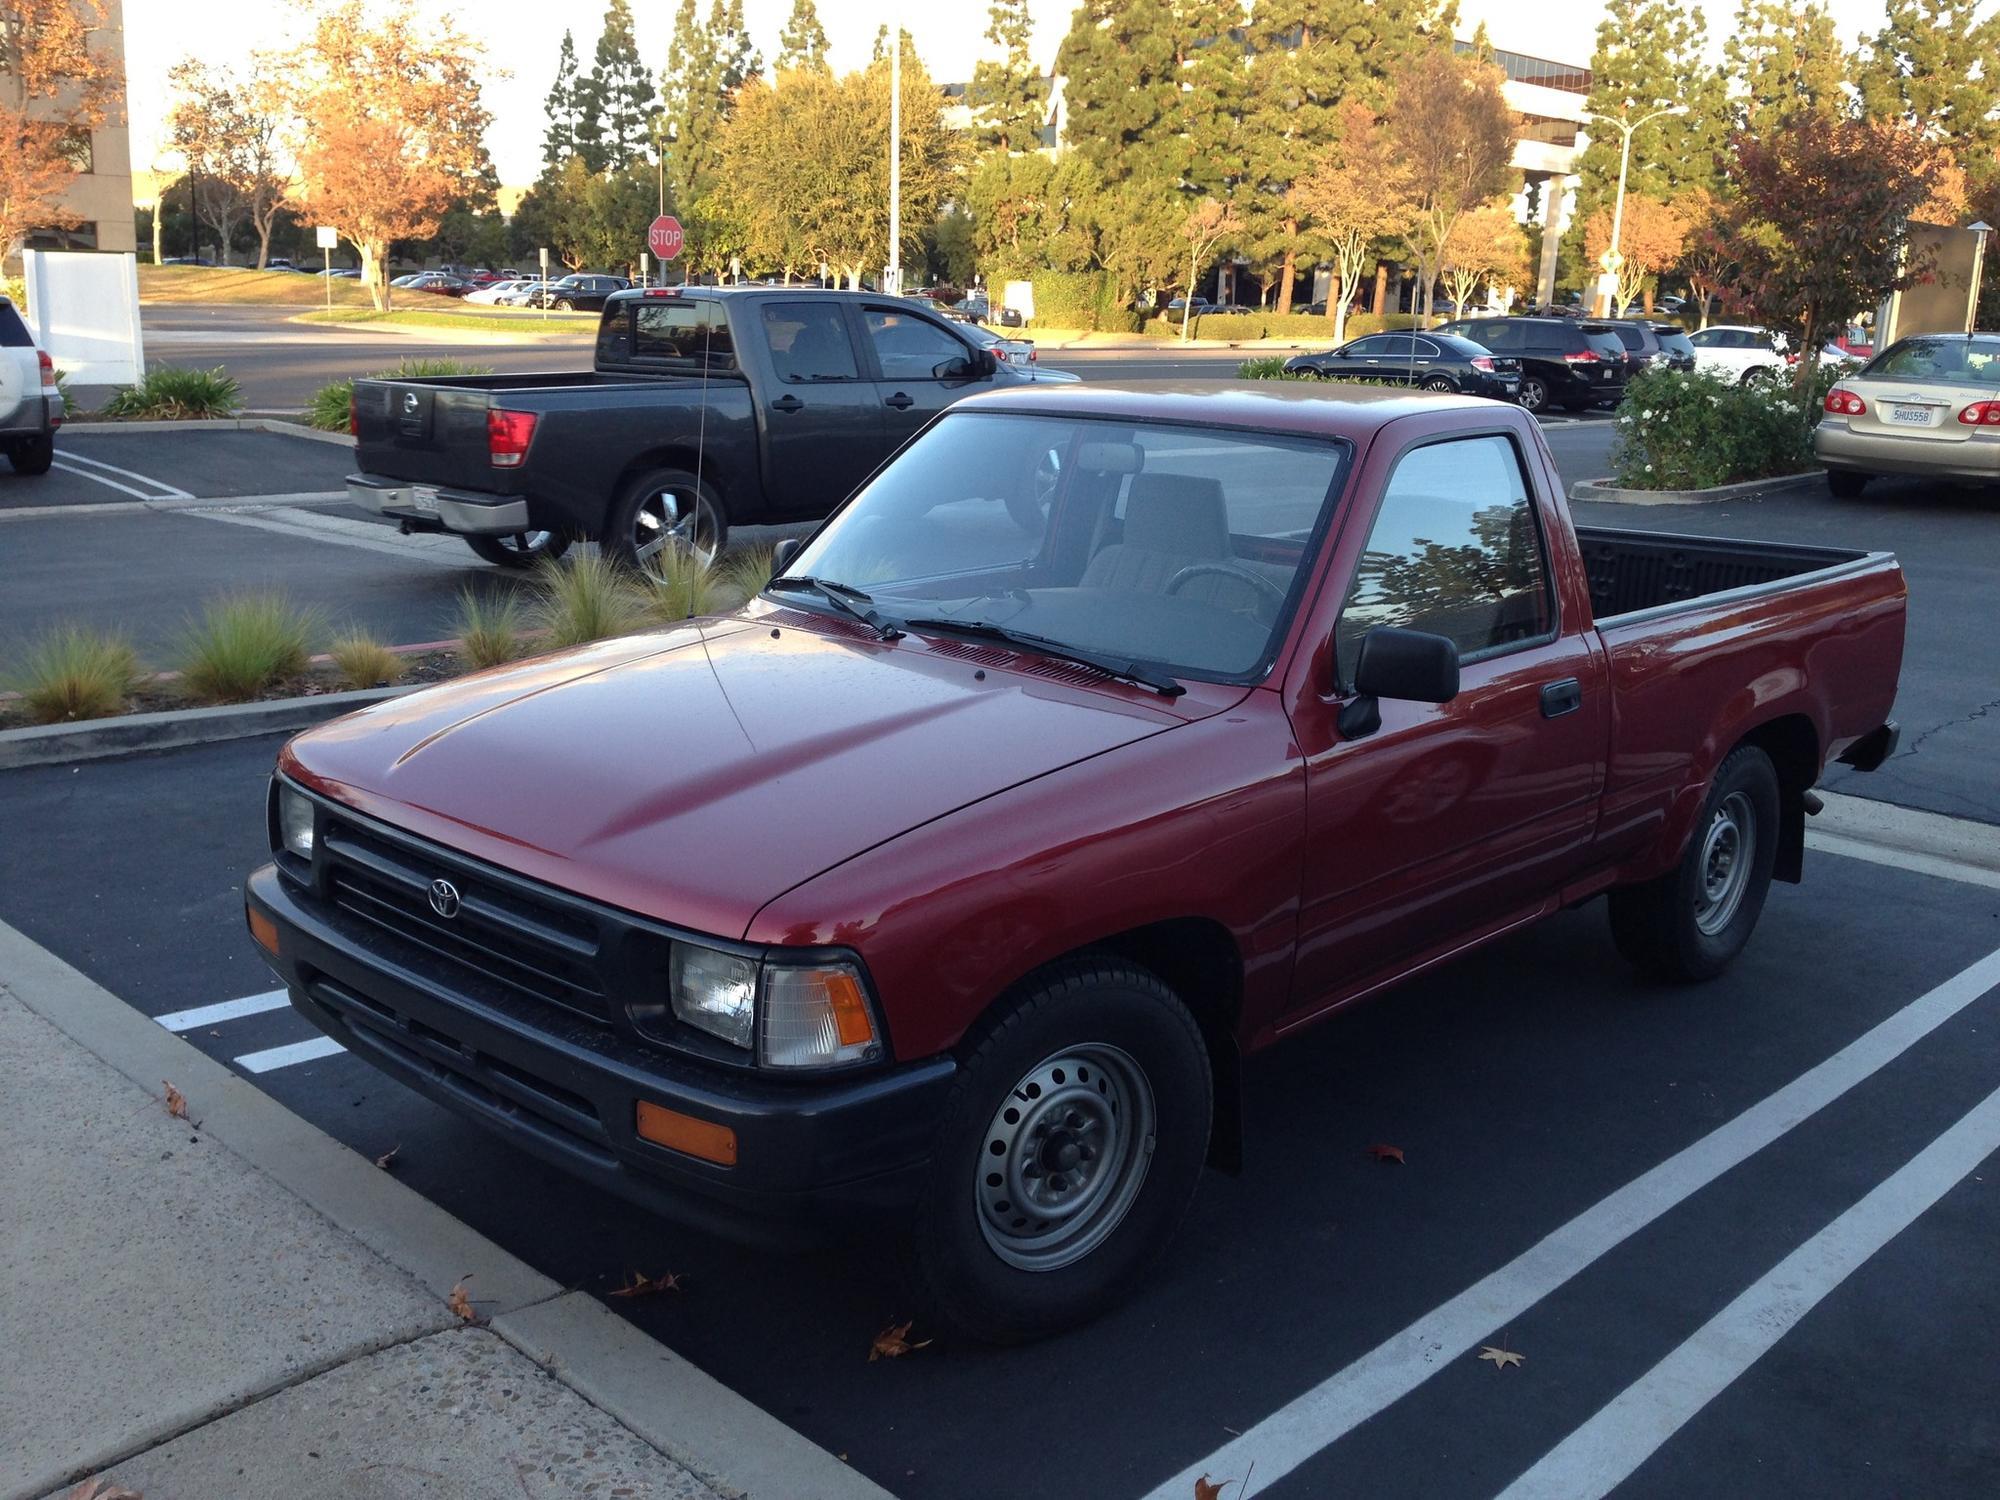 Rep. Loretta Sanchez still owns the Toyota pickup she bought in 1992.